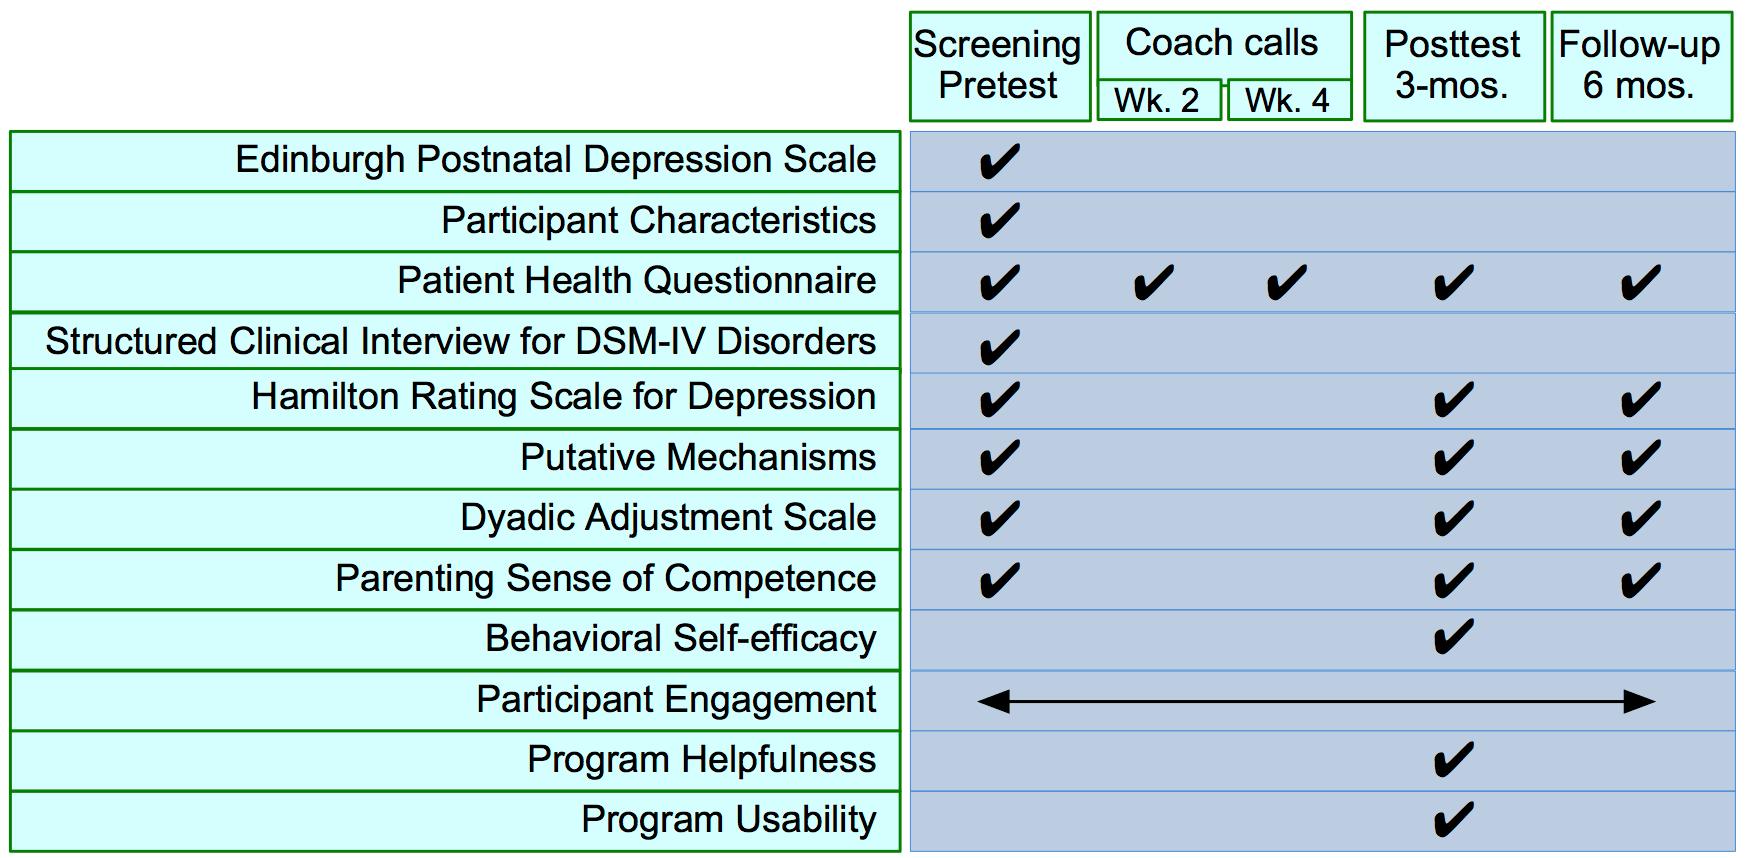 JMIR MomMoodBooster Web Based Intervention For Postpartum Depression